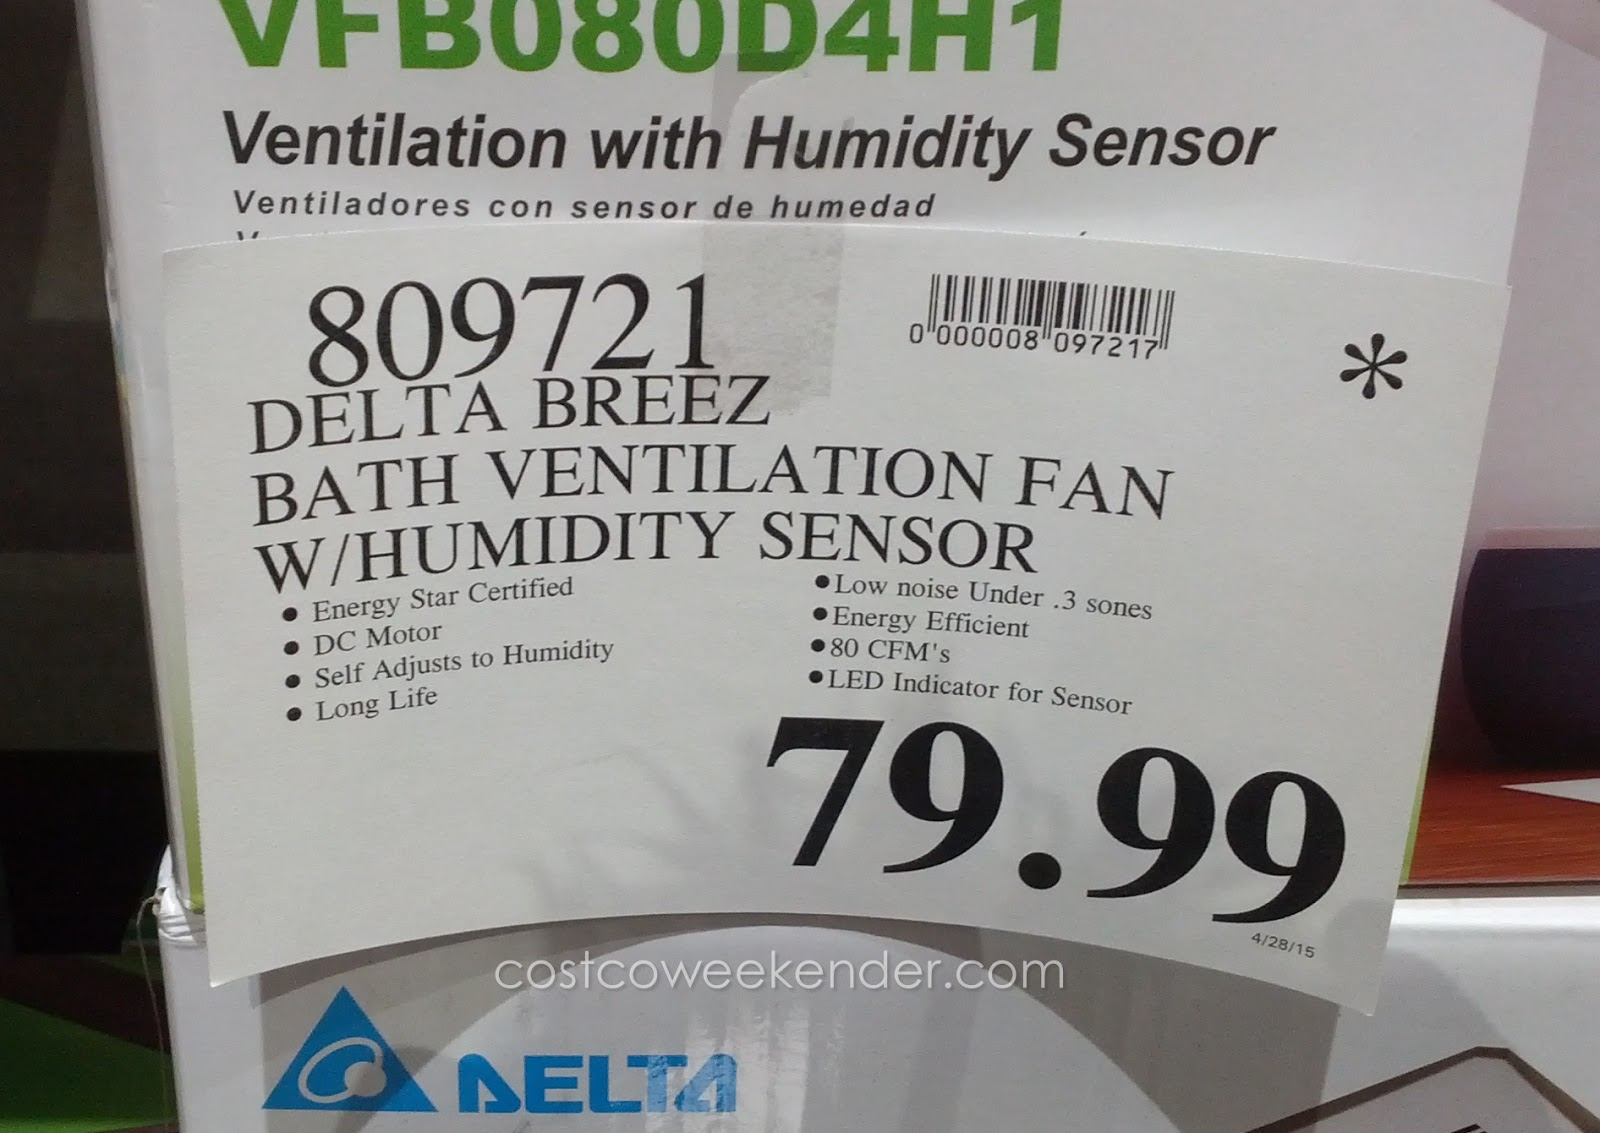 Delta Breez Vfb080d4h1 Bath Ventilation Fan System To Control The Humidity